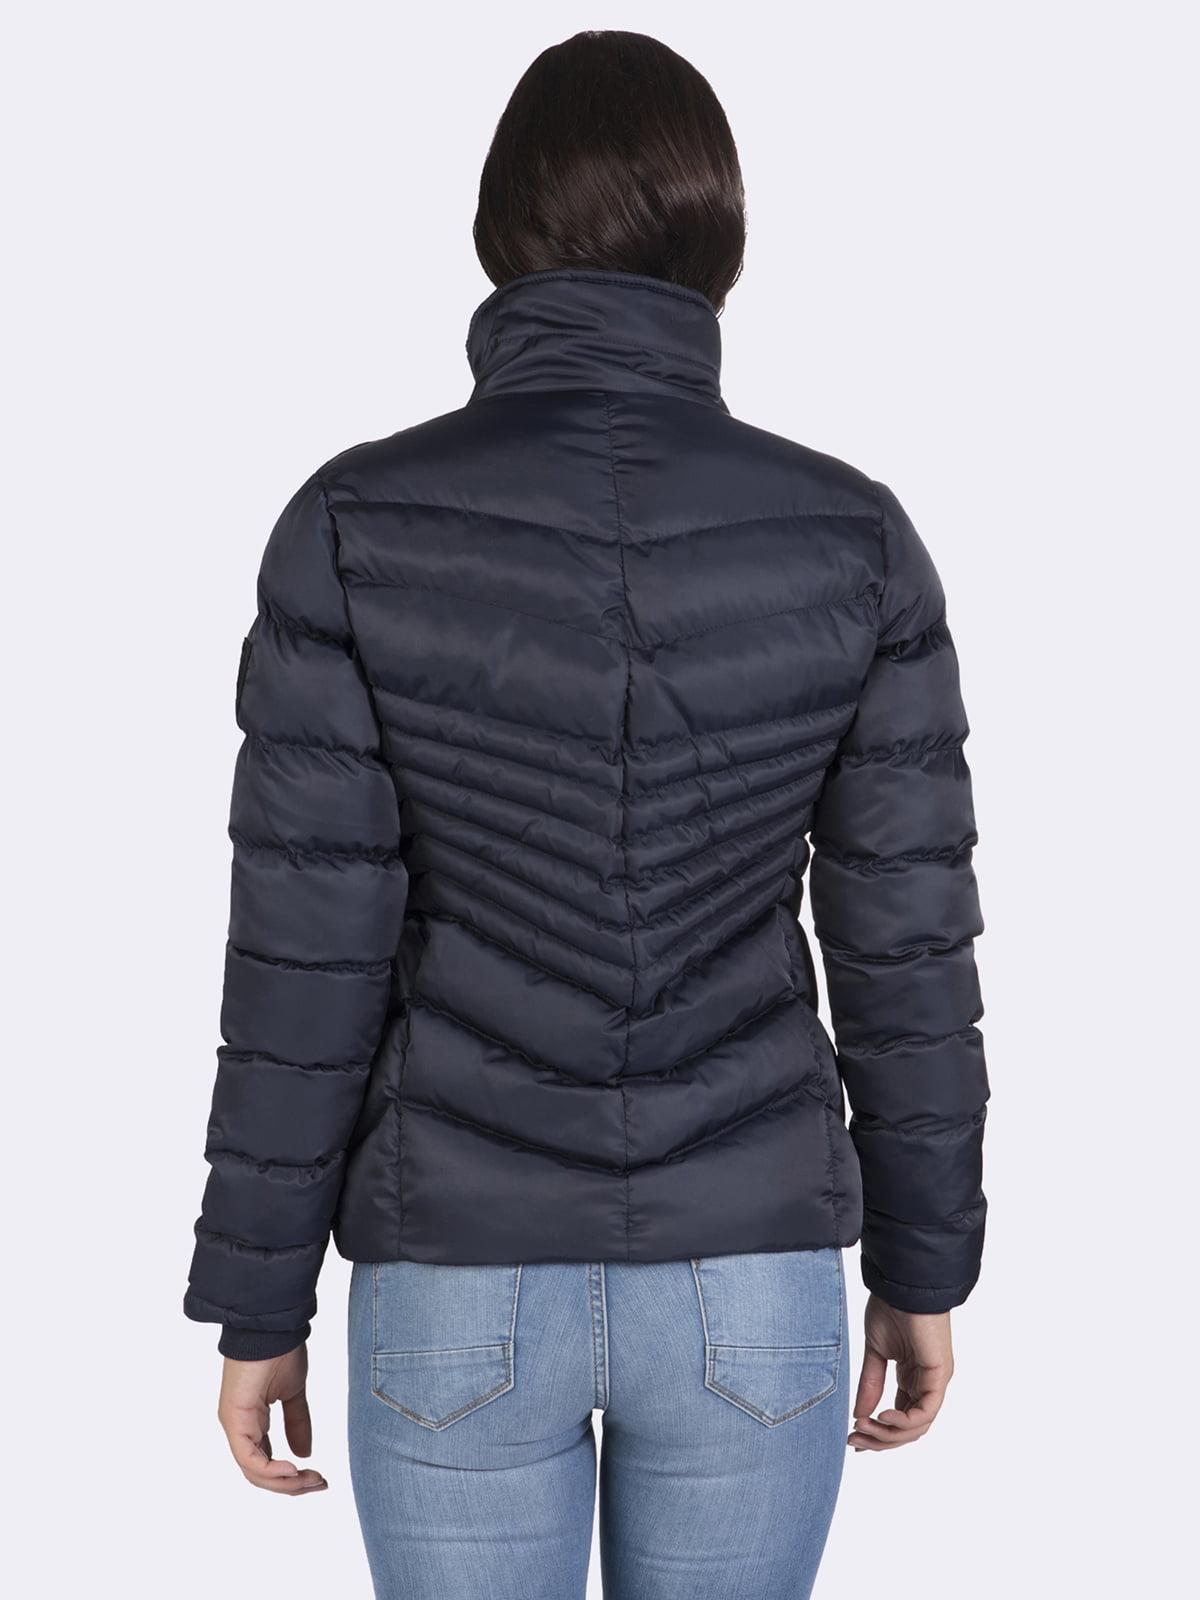 Куртка темно-синяя | 4592974 | фото 8